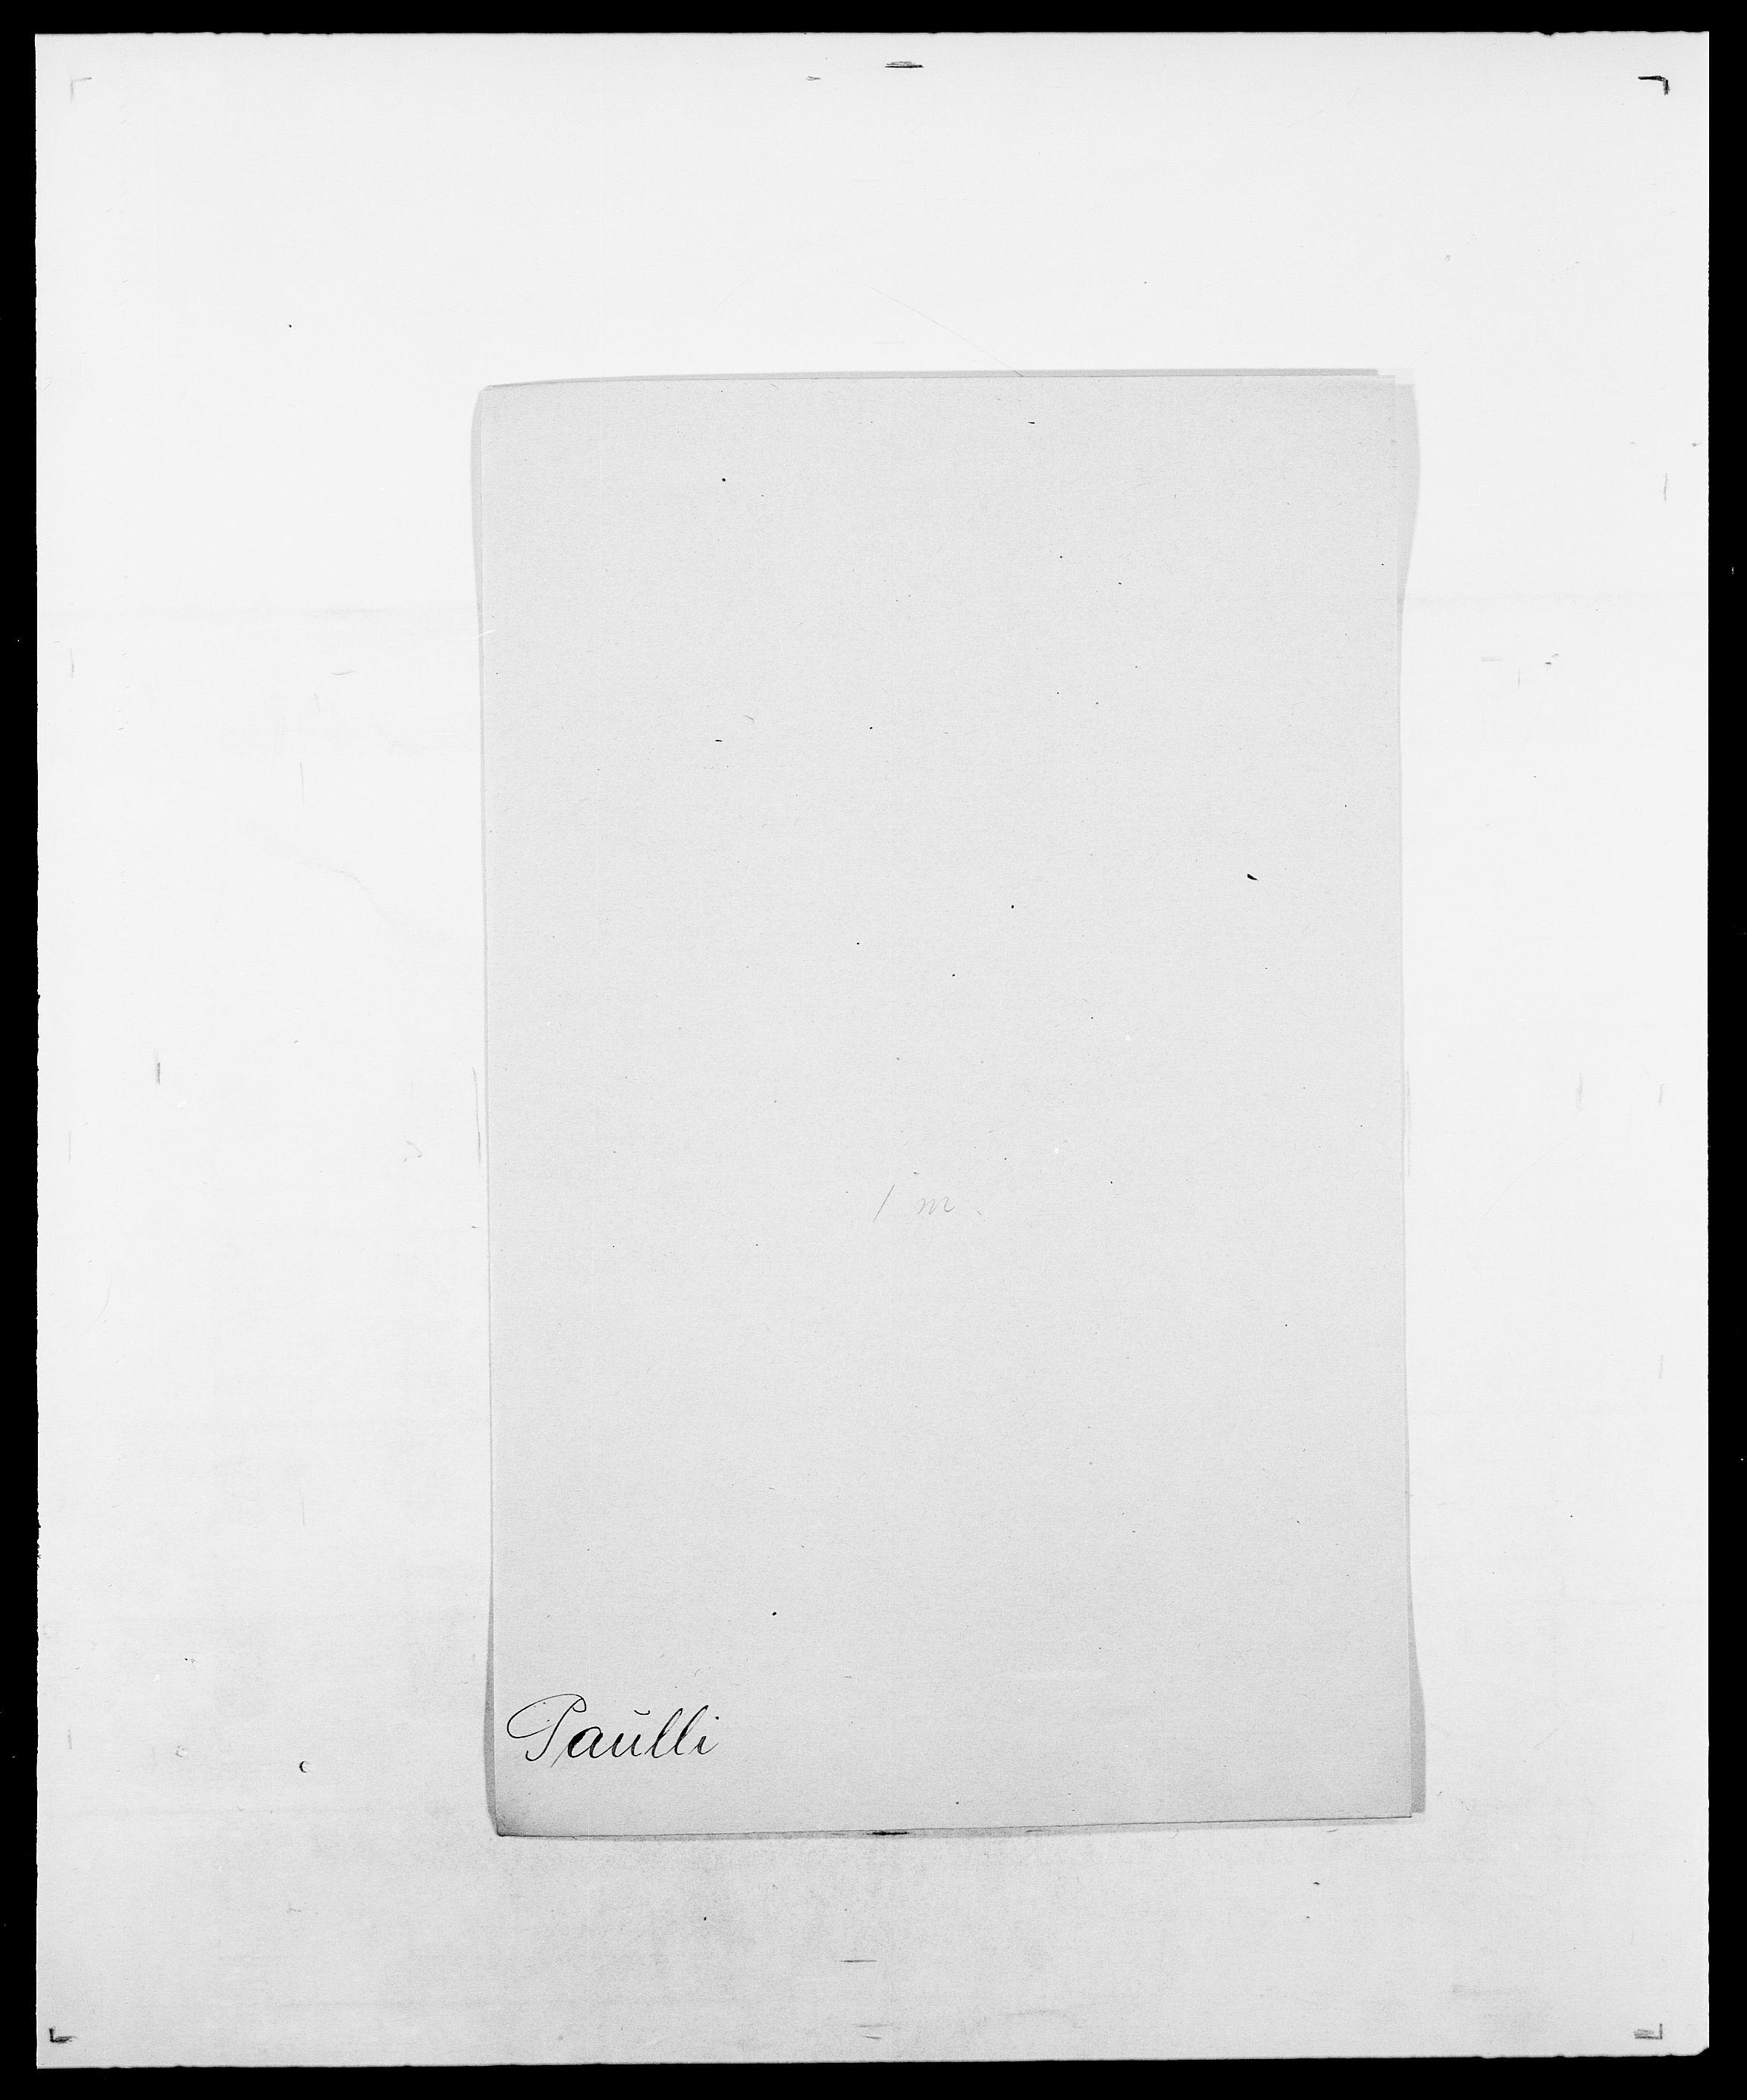 SAO, Delgobe, Charles Antoine - samling, D/Da/L0030: Paars - Pittelkov, s. 151